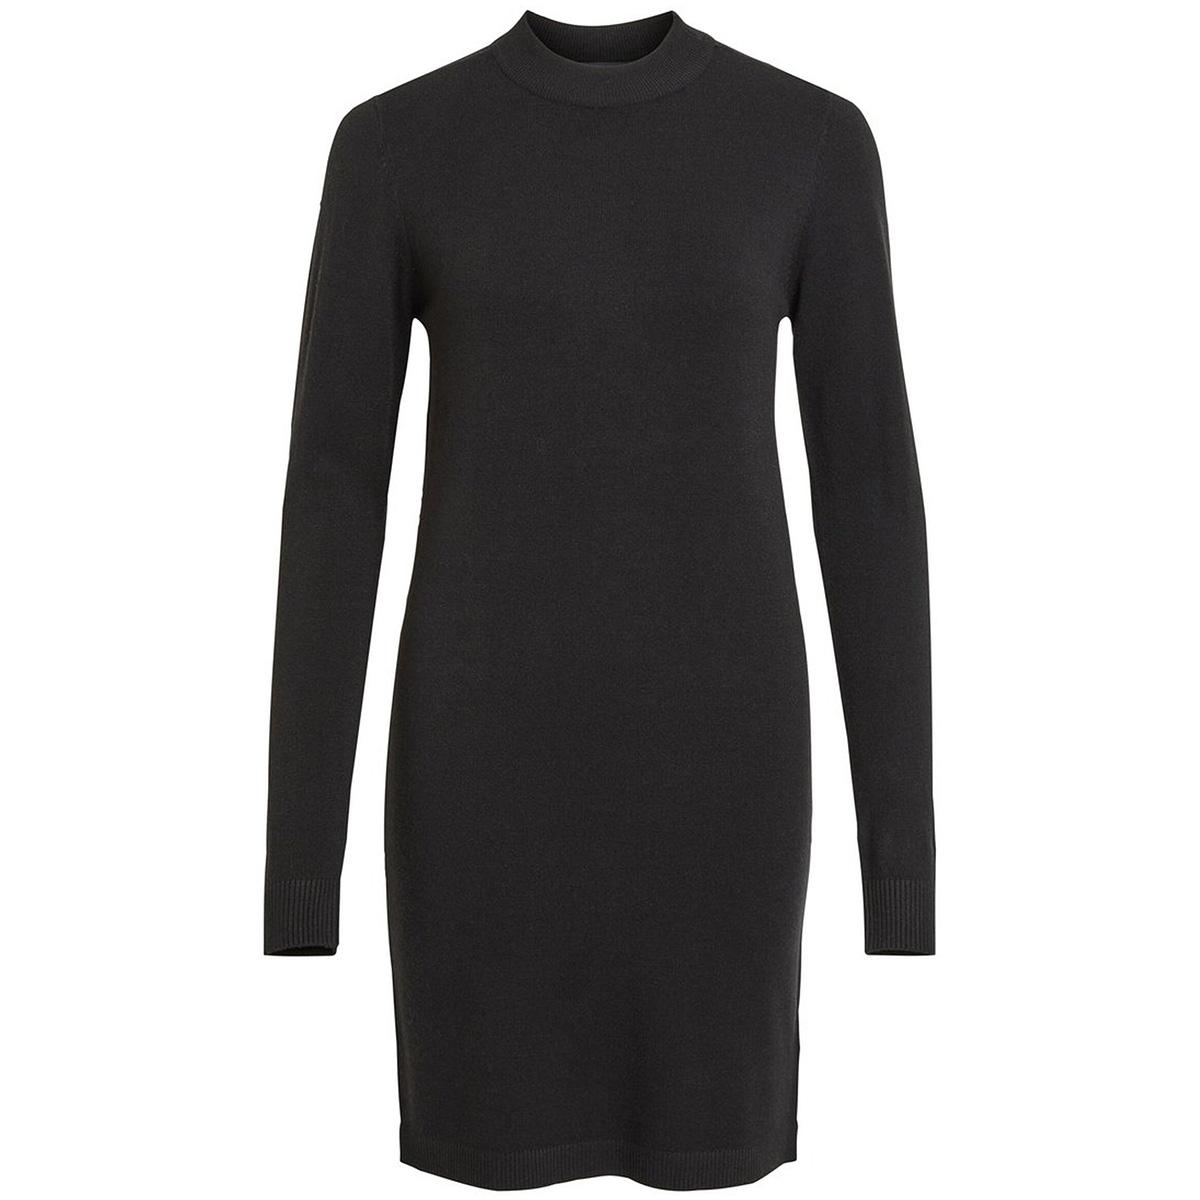 objthess l/s knit dress noos 23030730 object jurk black